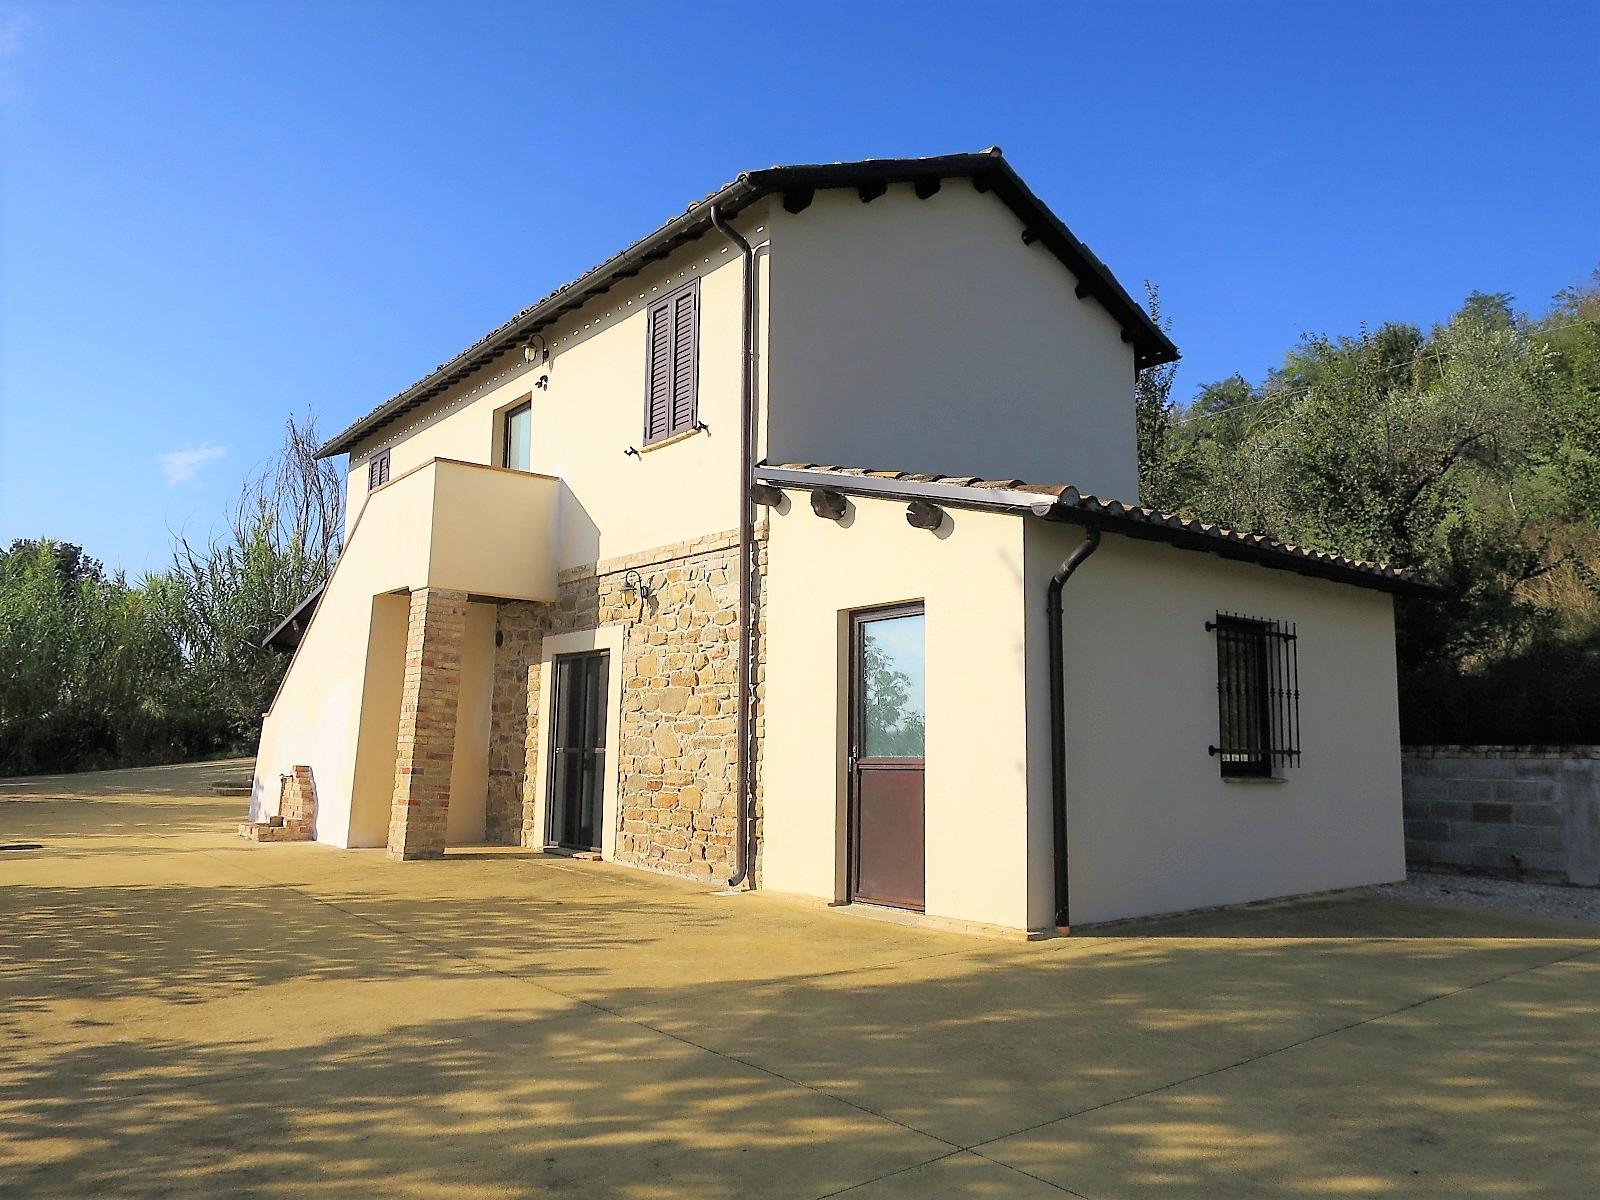 Country Houses Country Houses for sale Montefino (TE), Casa Collina - Montefino - EUR 159.972 260